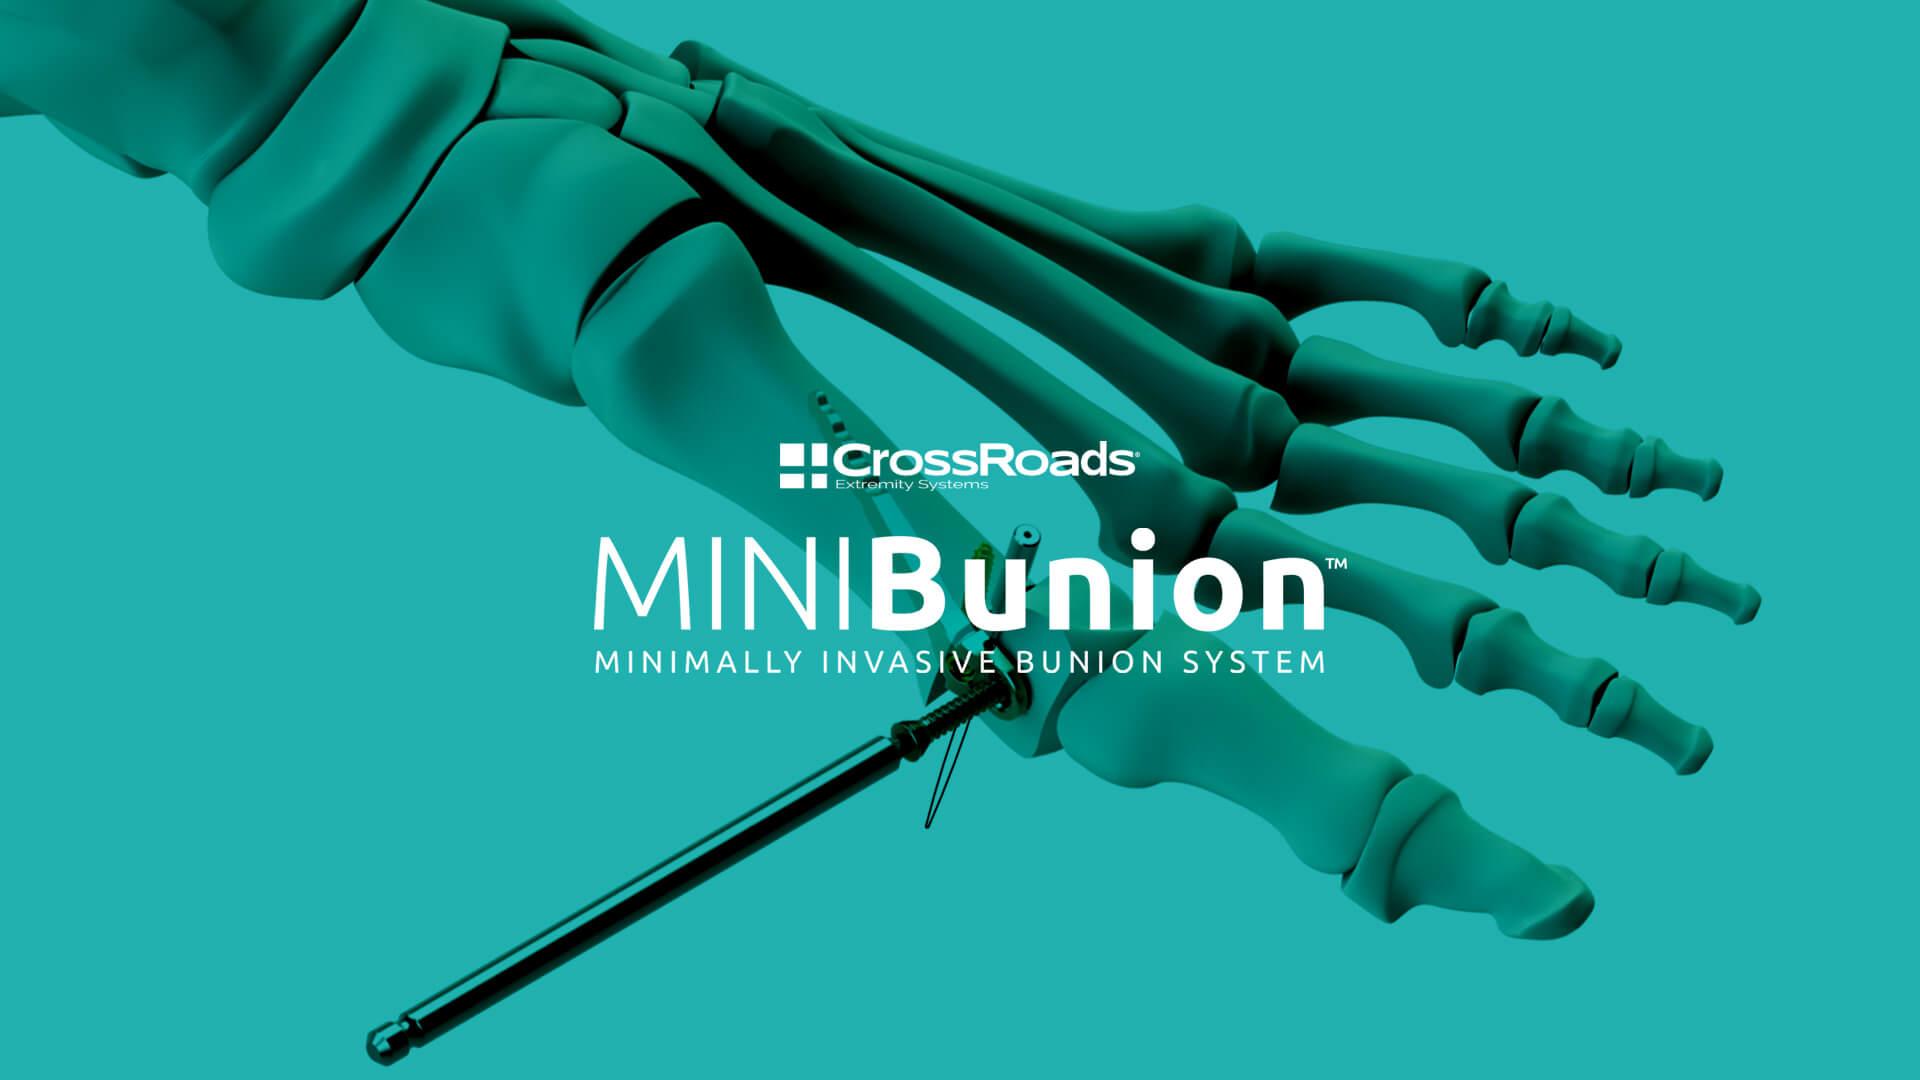 CrossRoads MINIBunion Minimally Invasive Bunion System